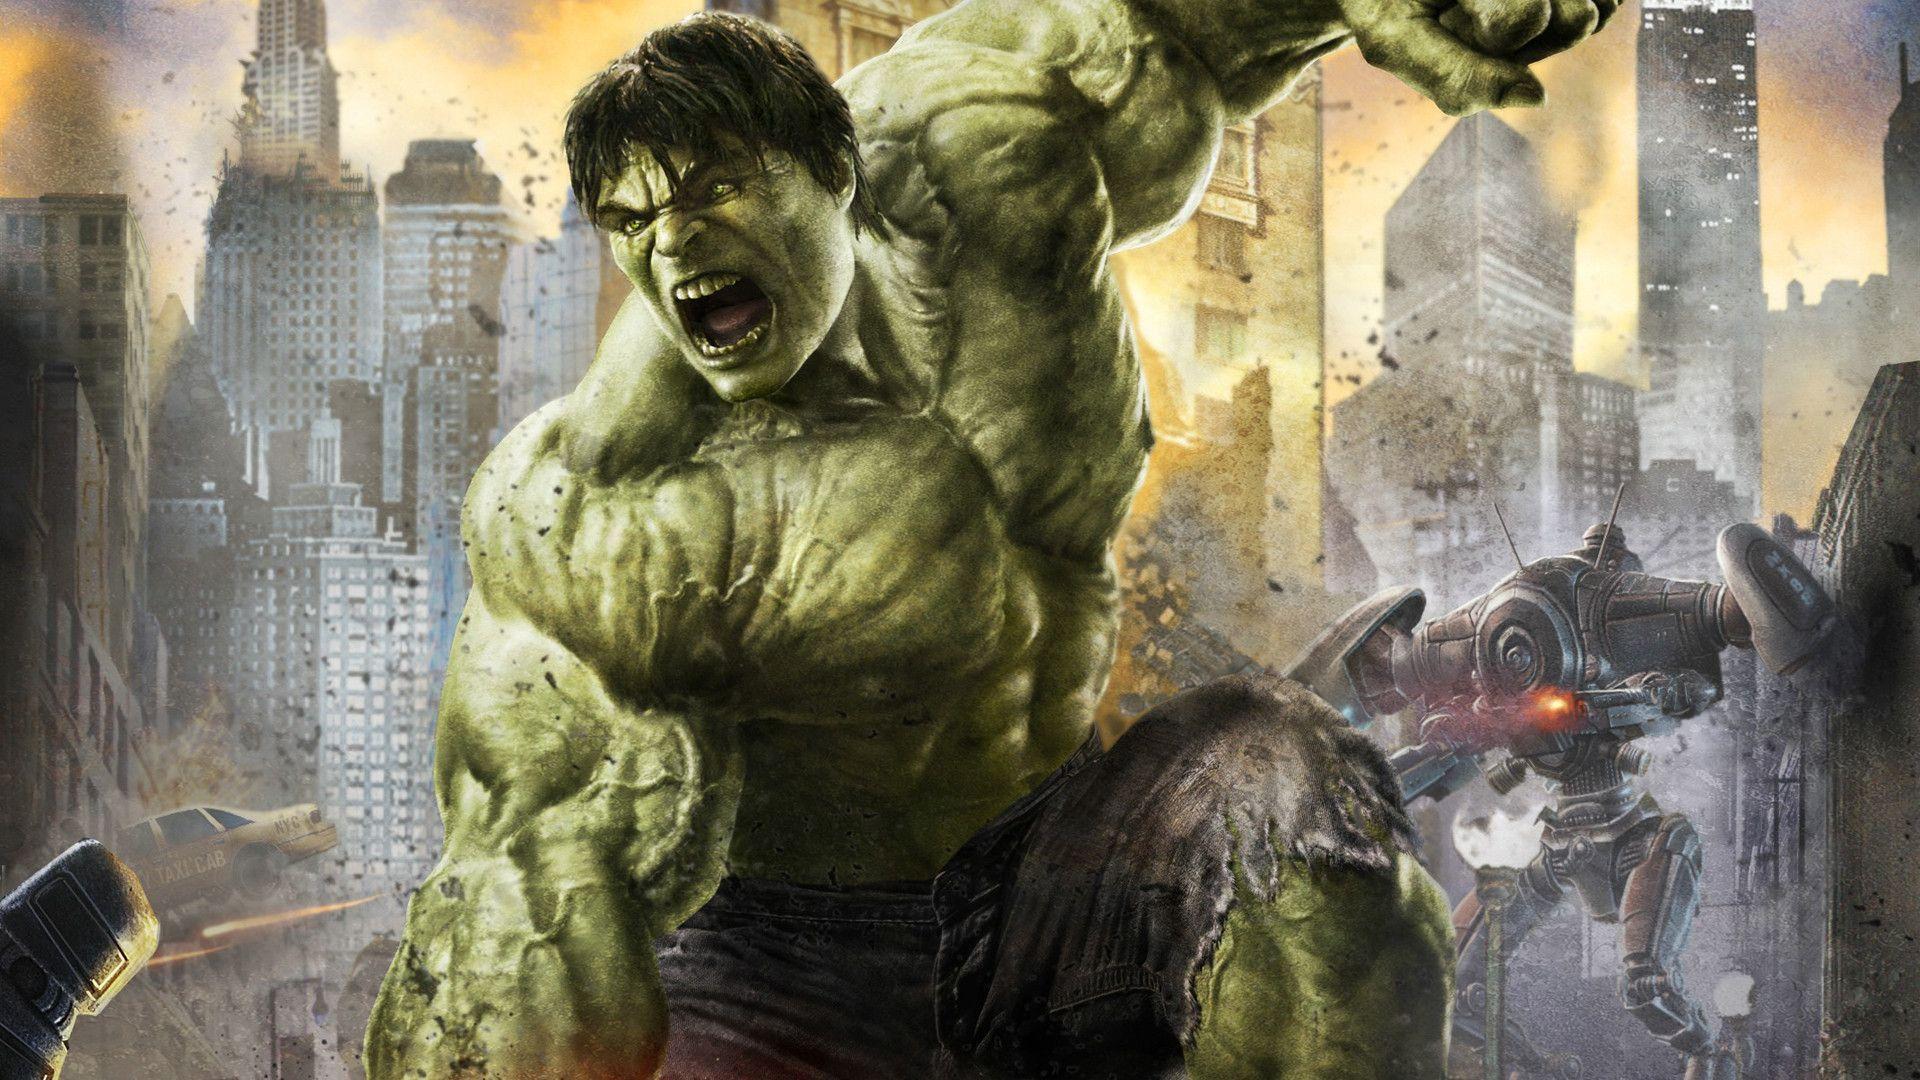 Incredible Hulk Game Wii wallpaper - 755704